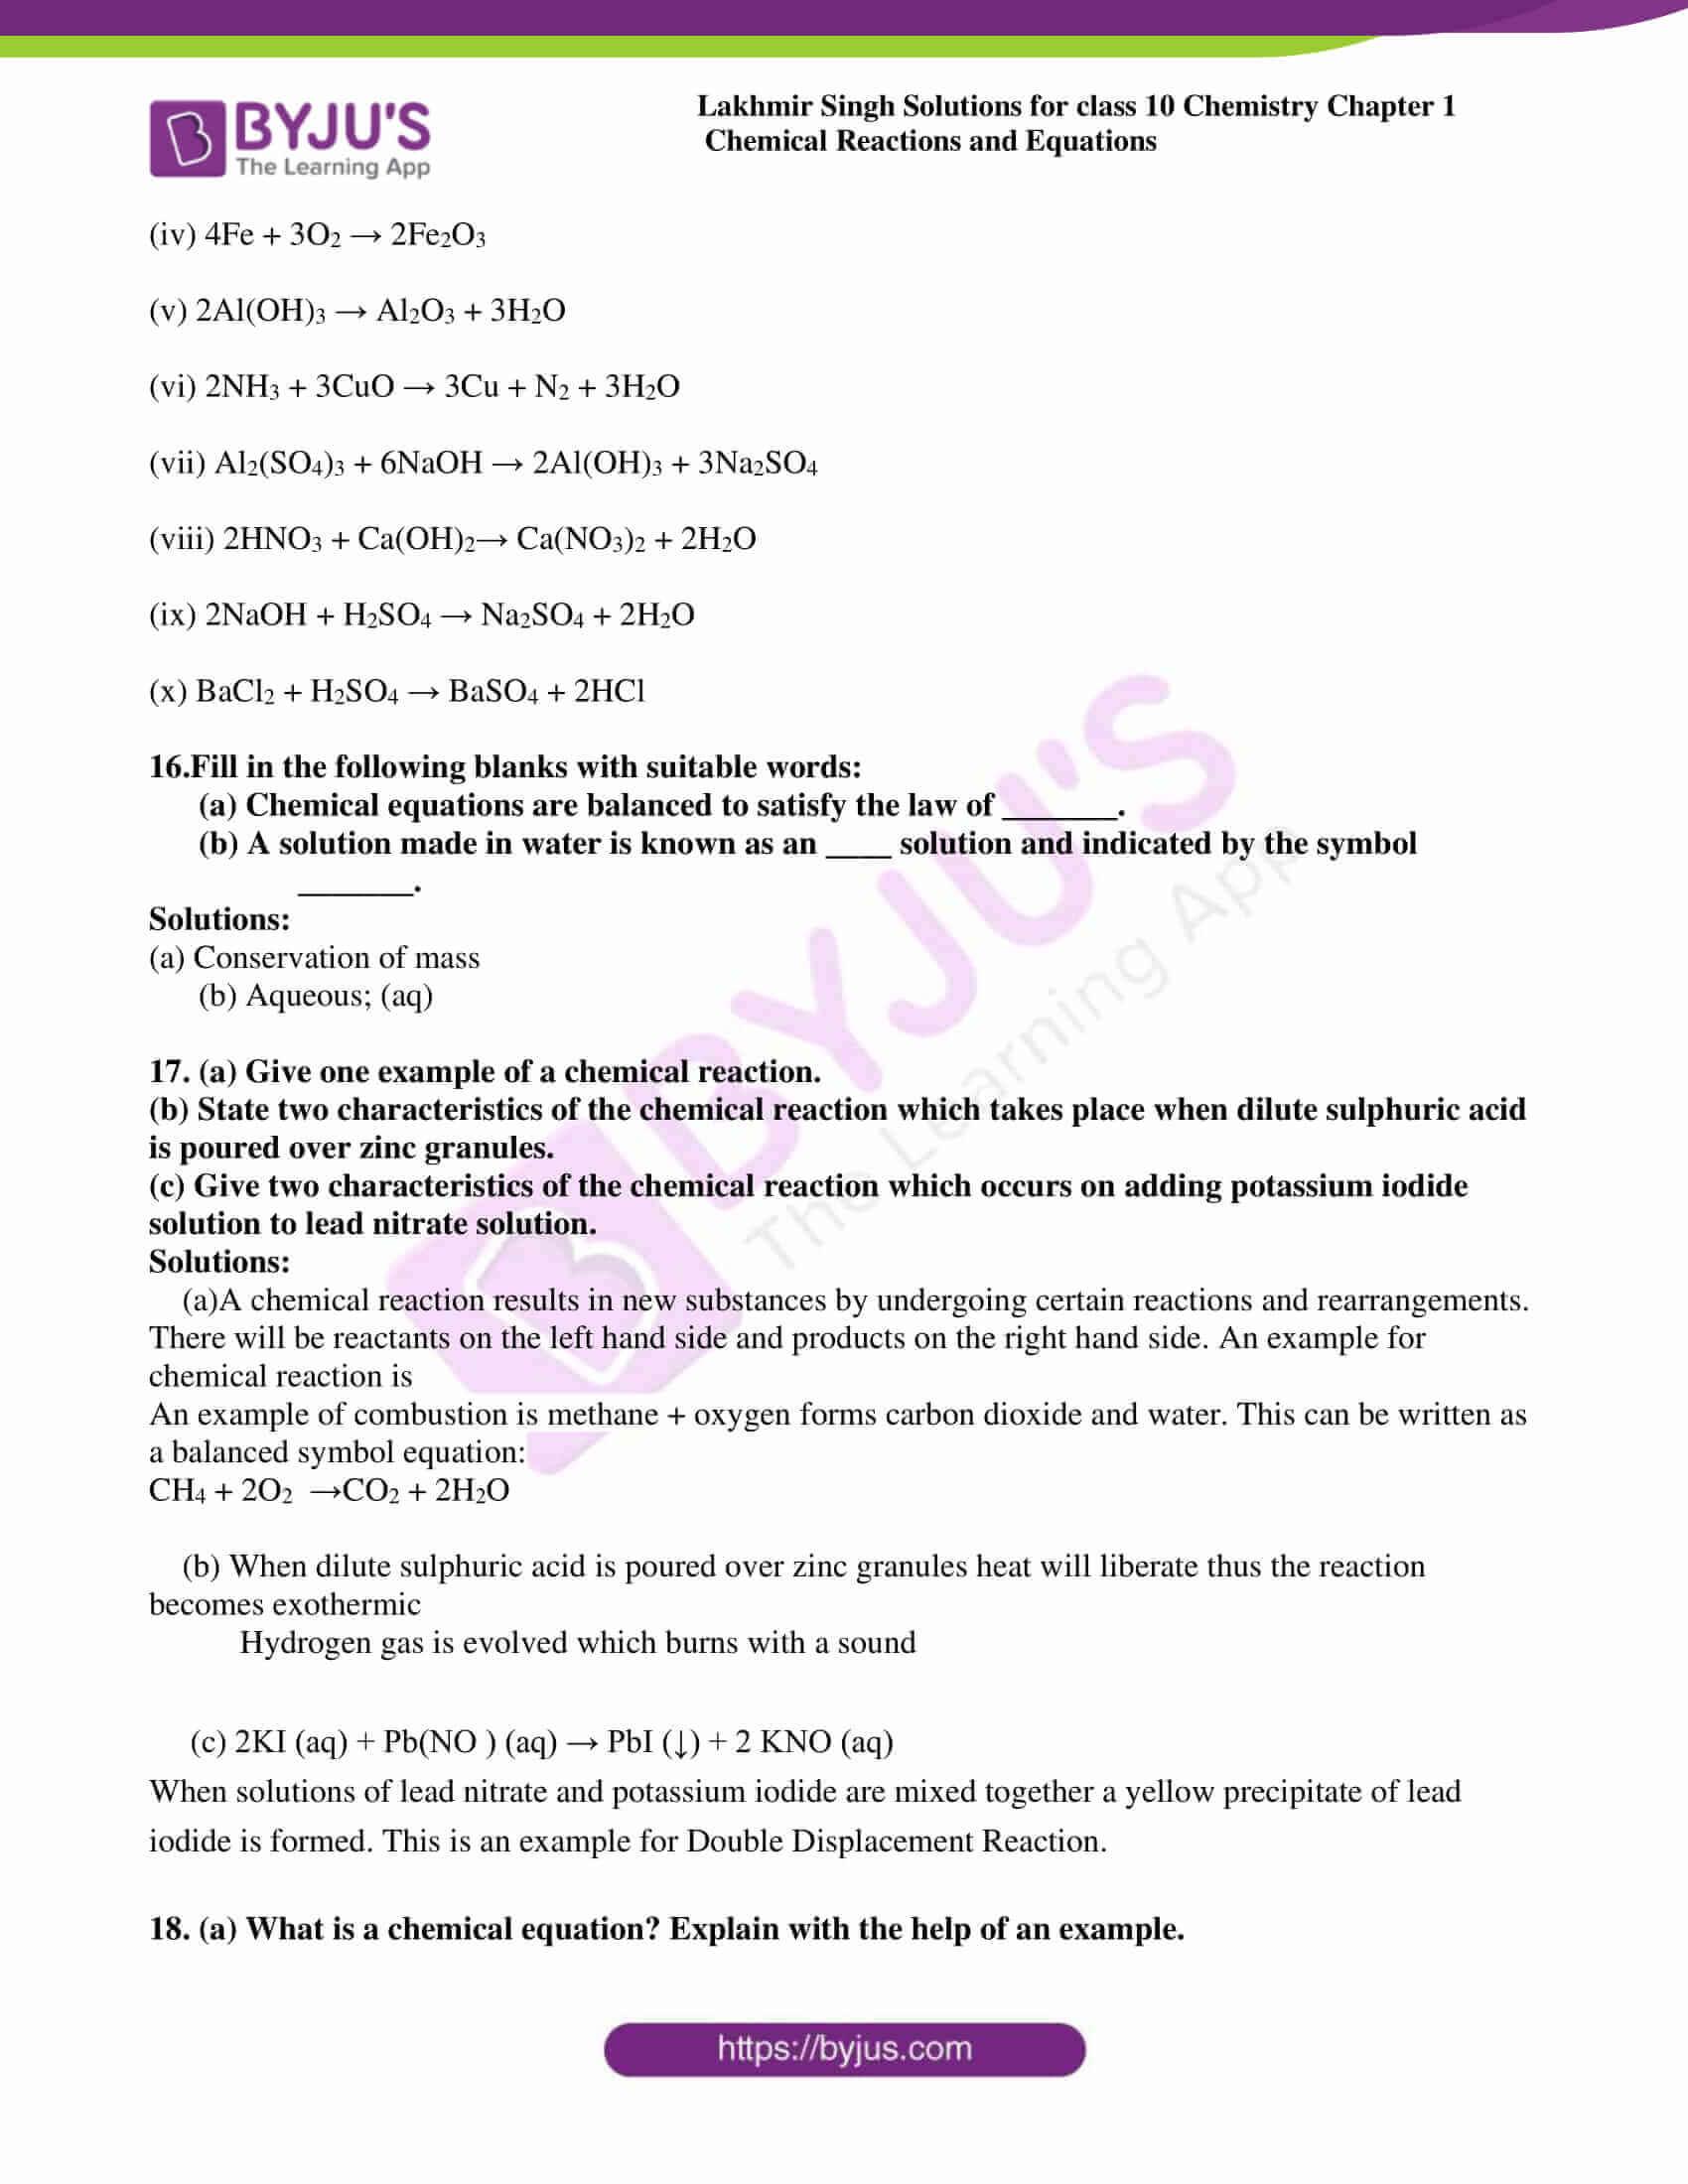 lakhmir singh sol class 10 che chapter 1 04